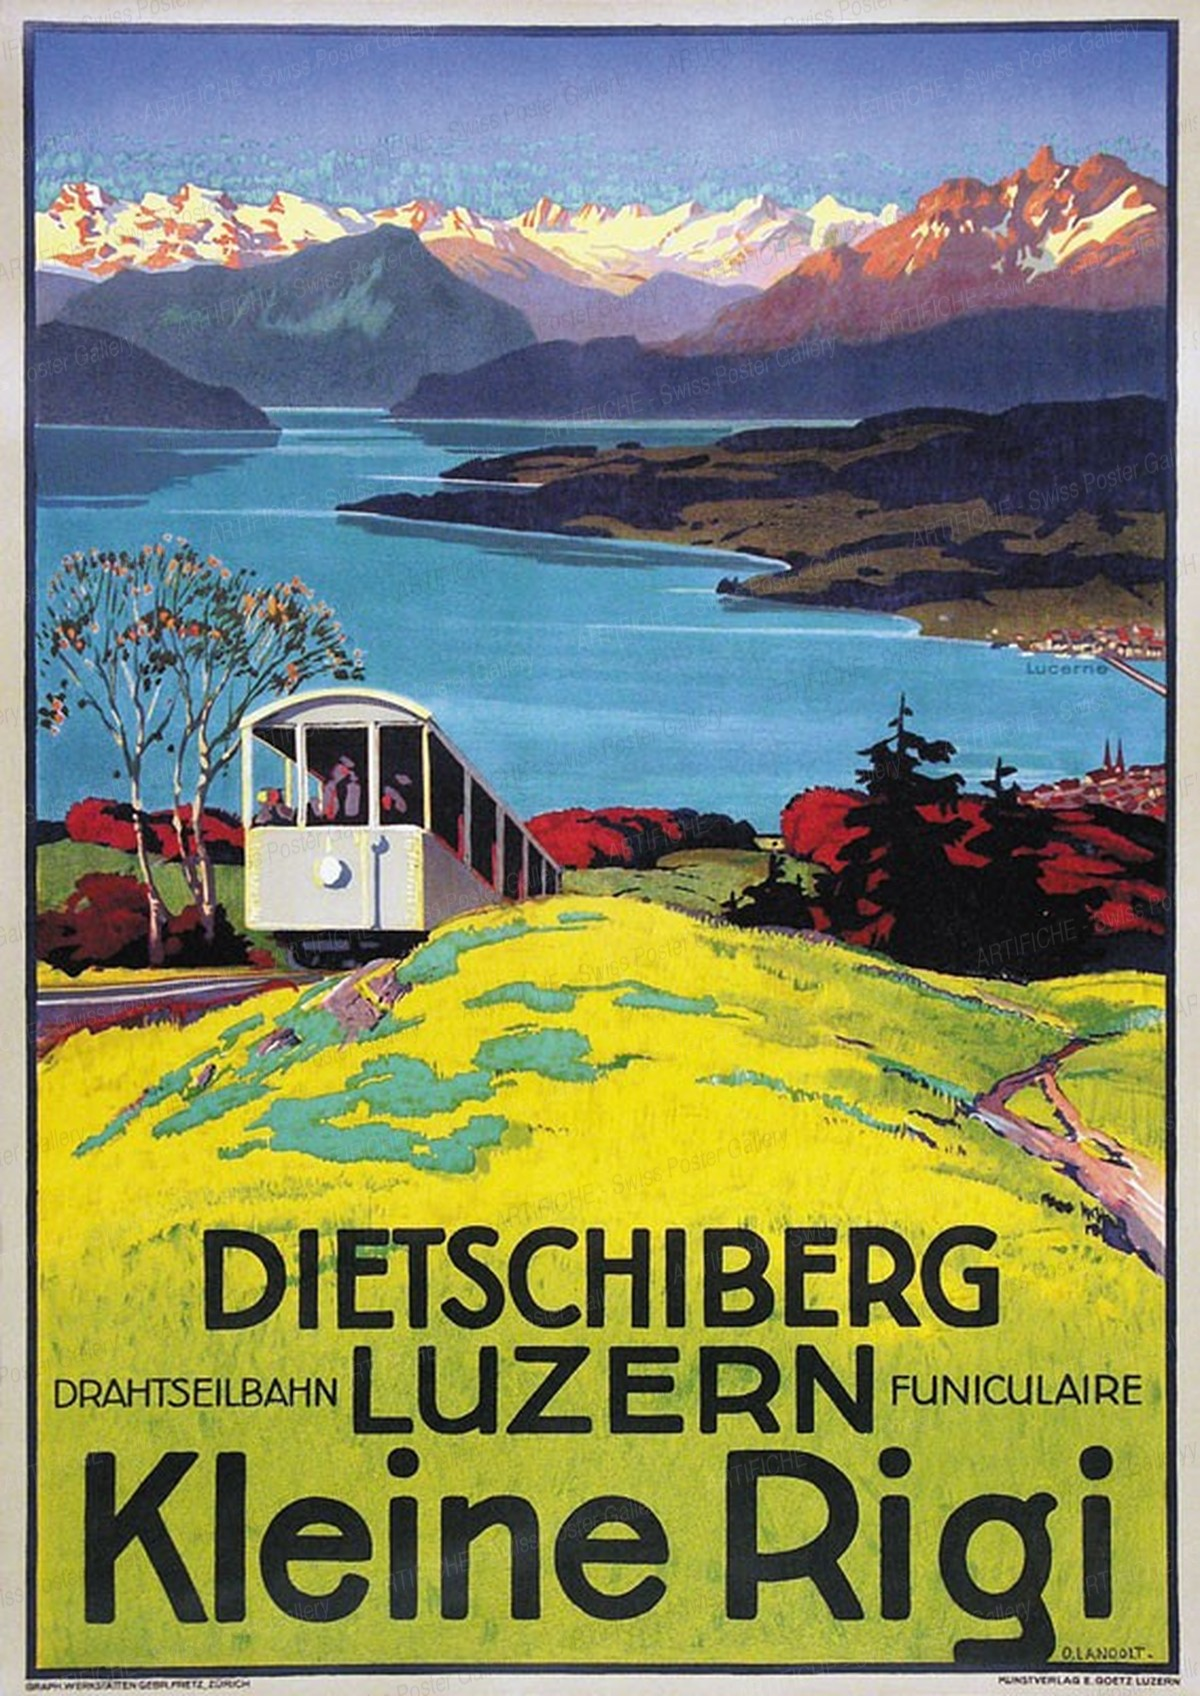 DIETSCHIBERG LUZERN – Kleine Rigi – Drahtseilbahn Funiculare, Otto Landolt